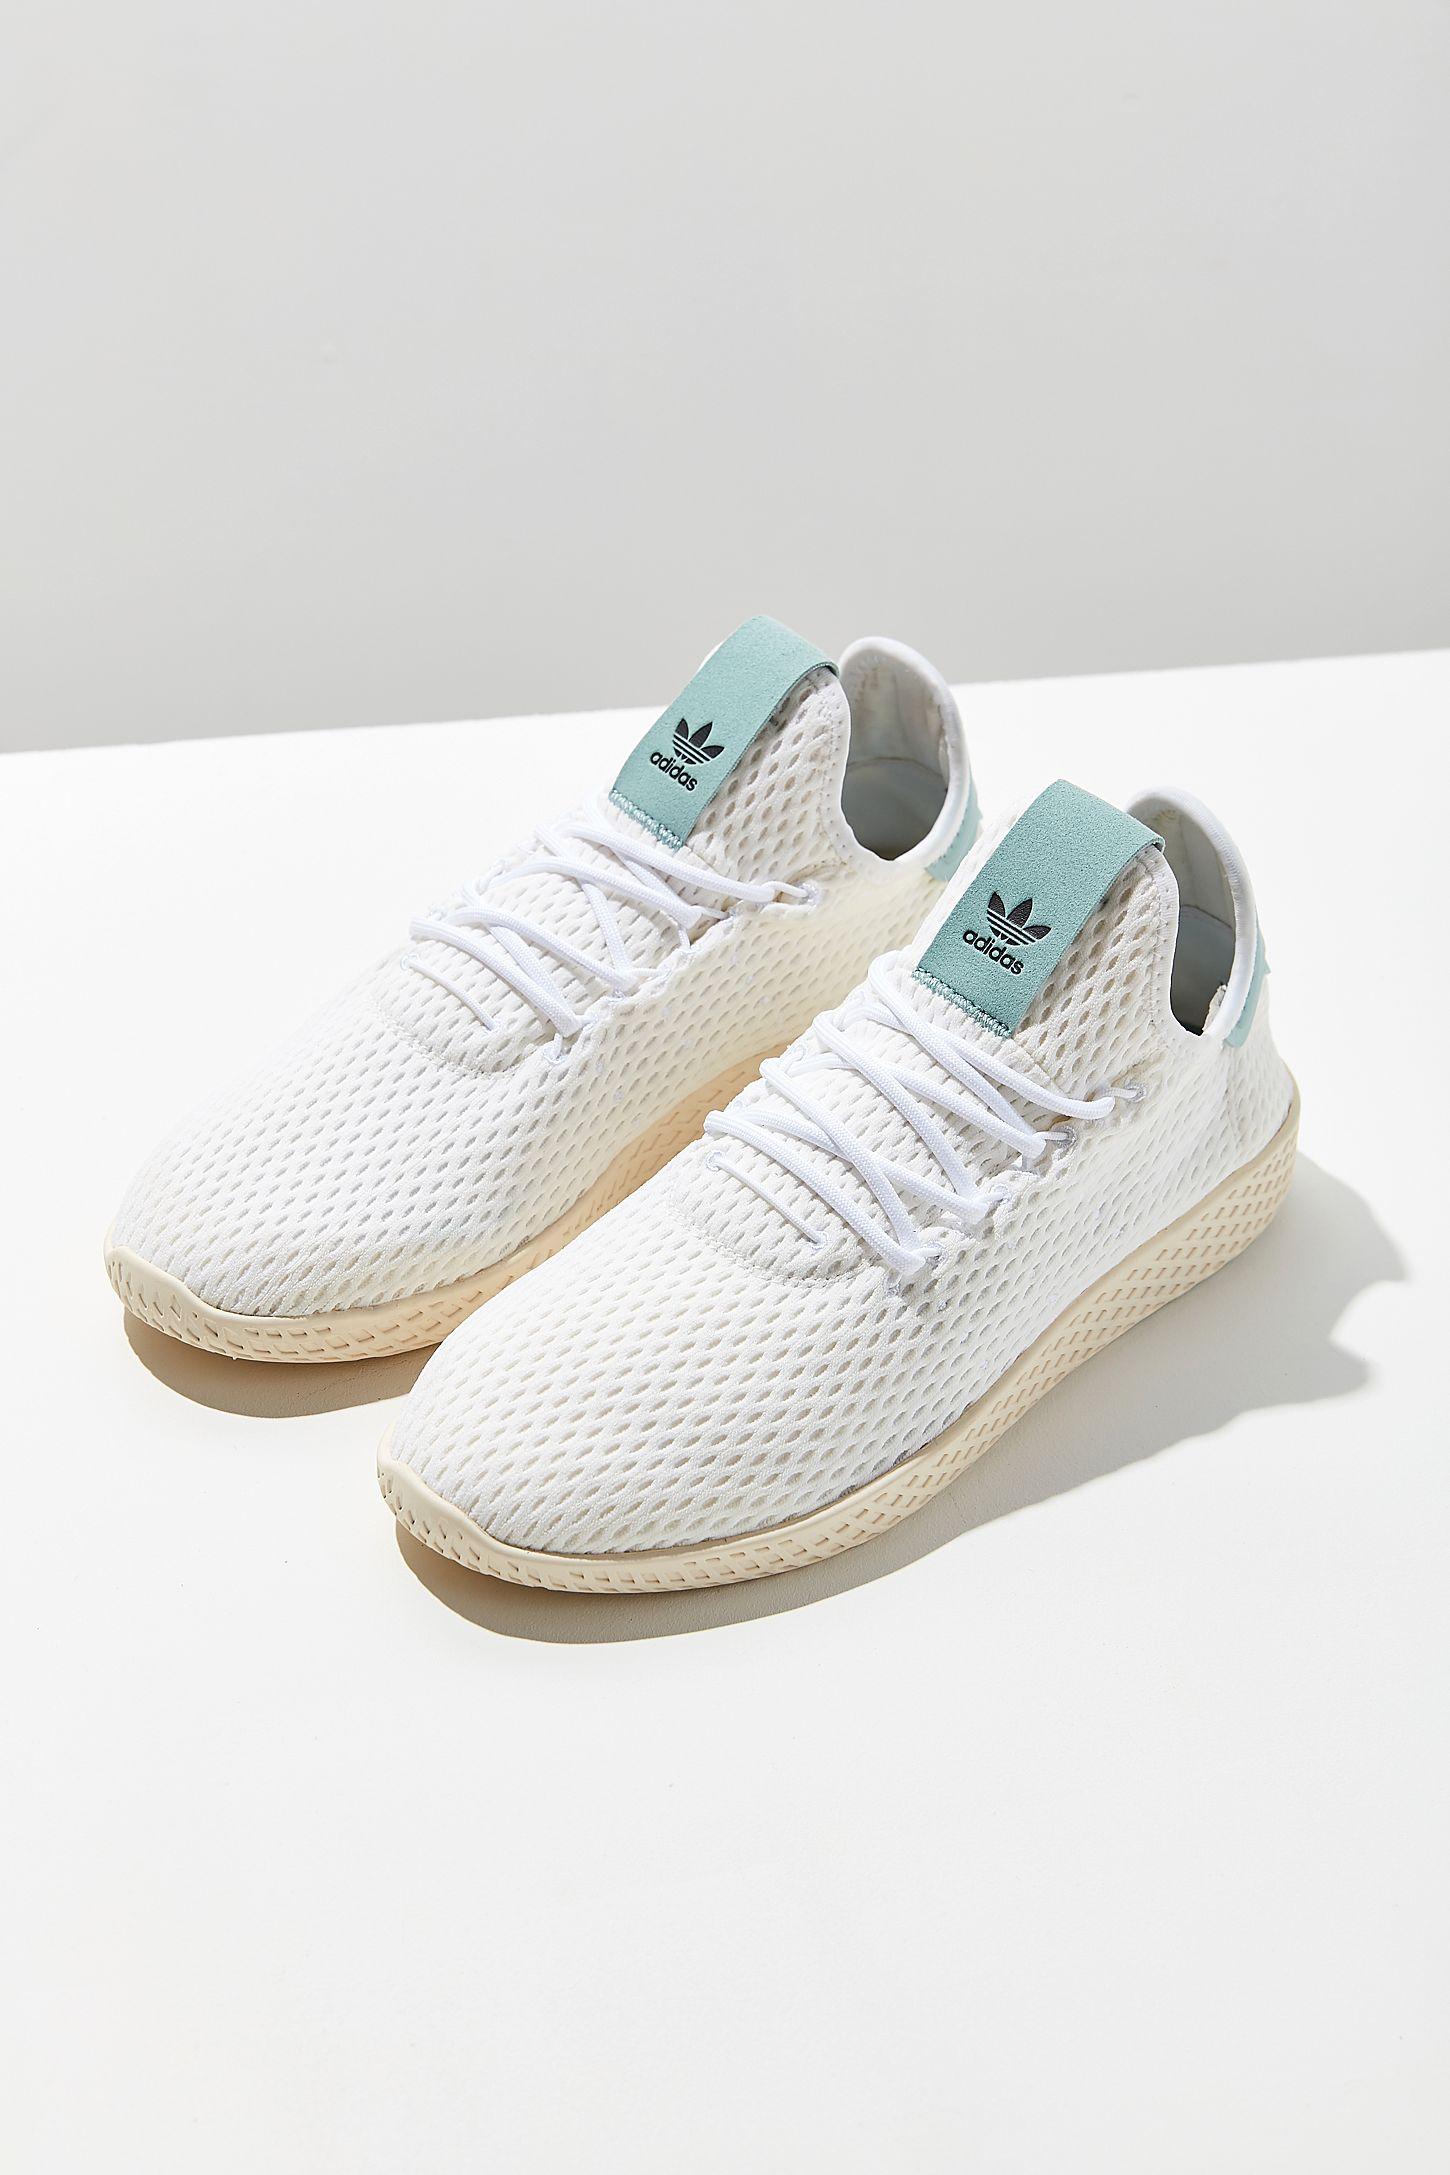 bedcf3e78ae7b adidas Originals X Pharrell Williams Tennis Hu Sneaker